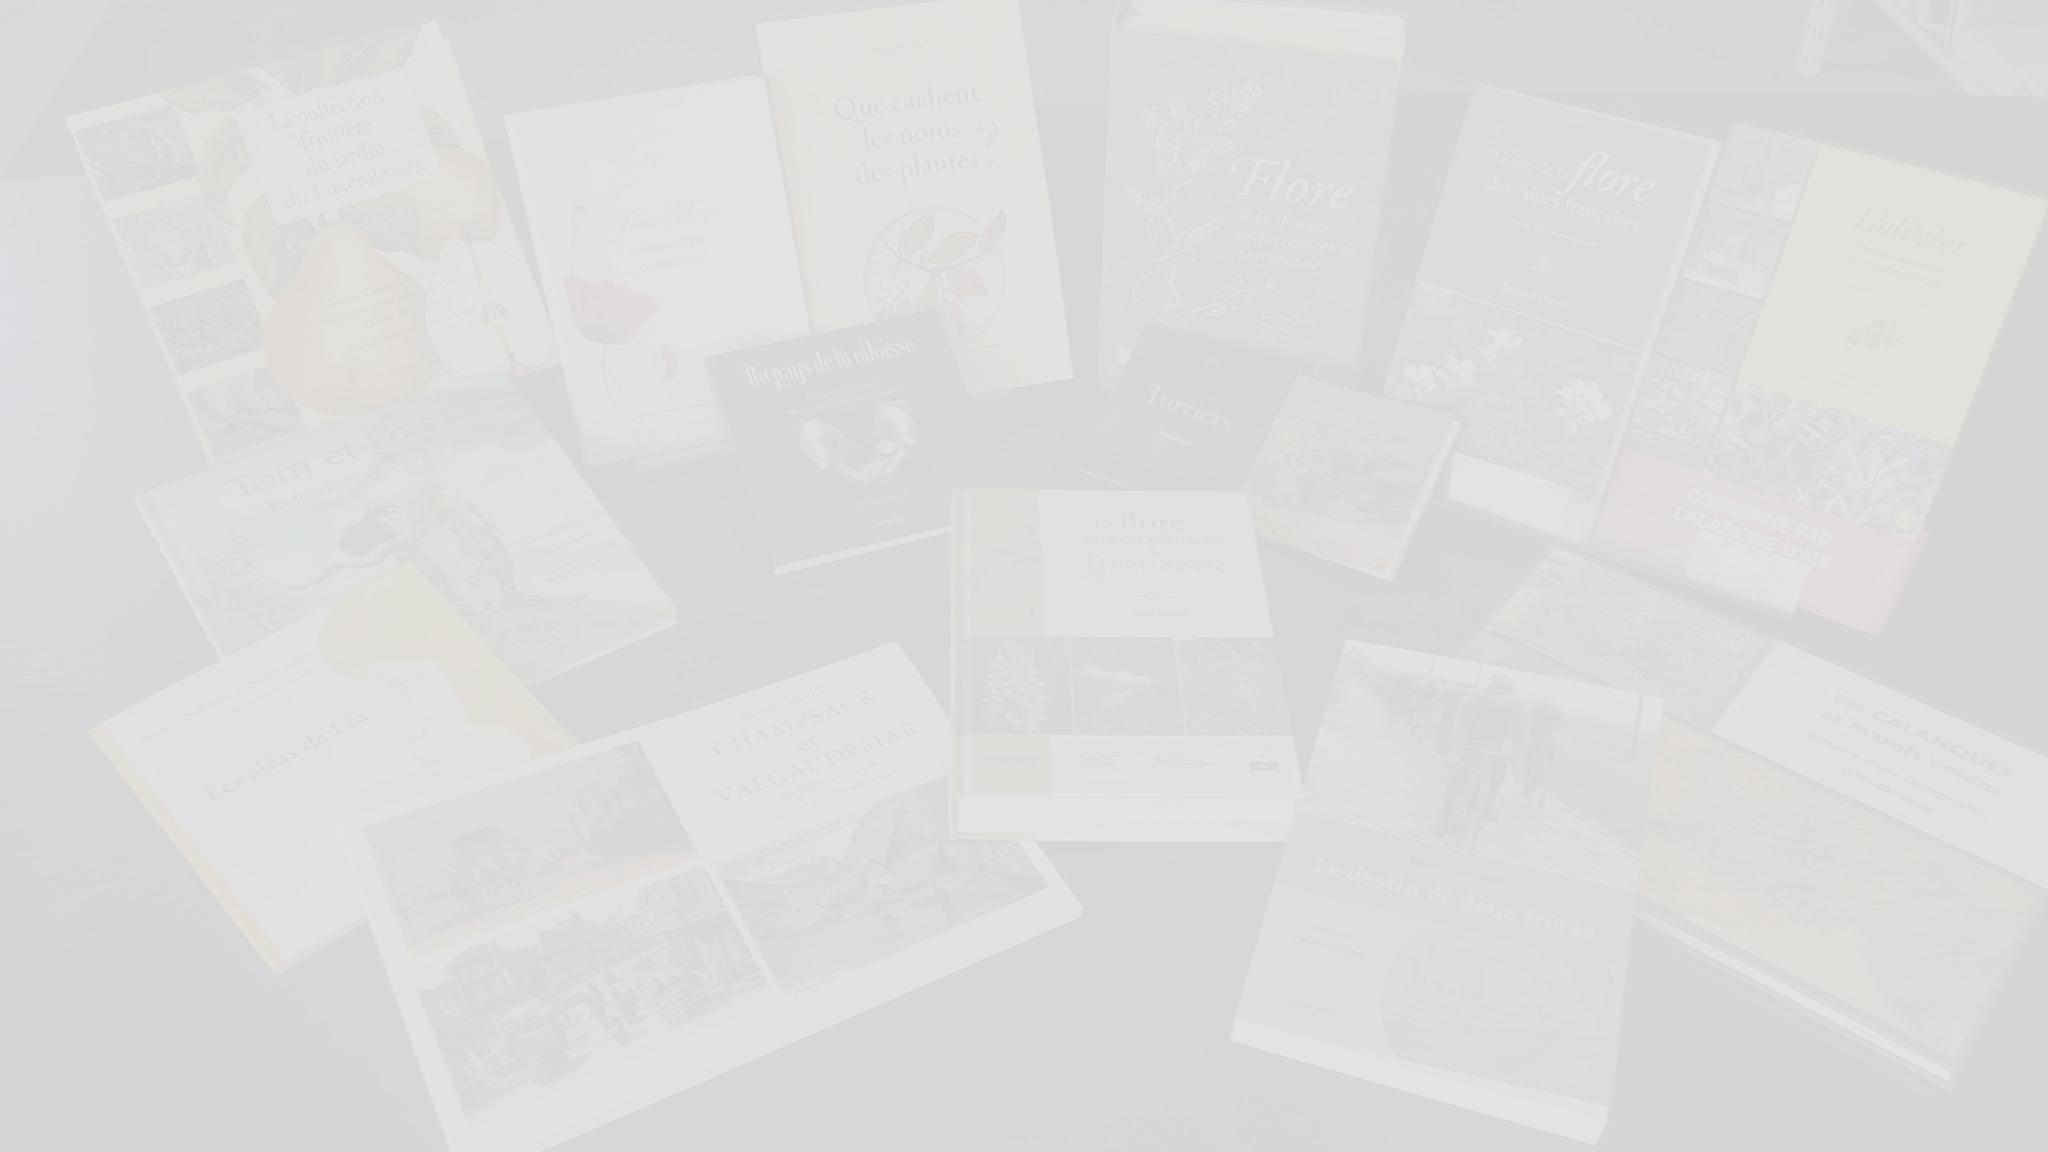 Naturalia-Publications-Turriers-04-slide01